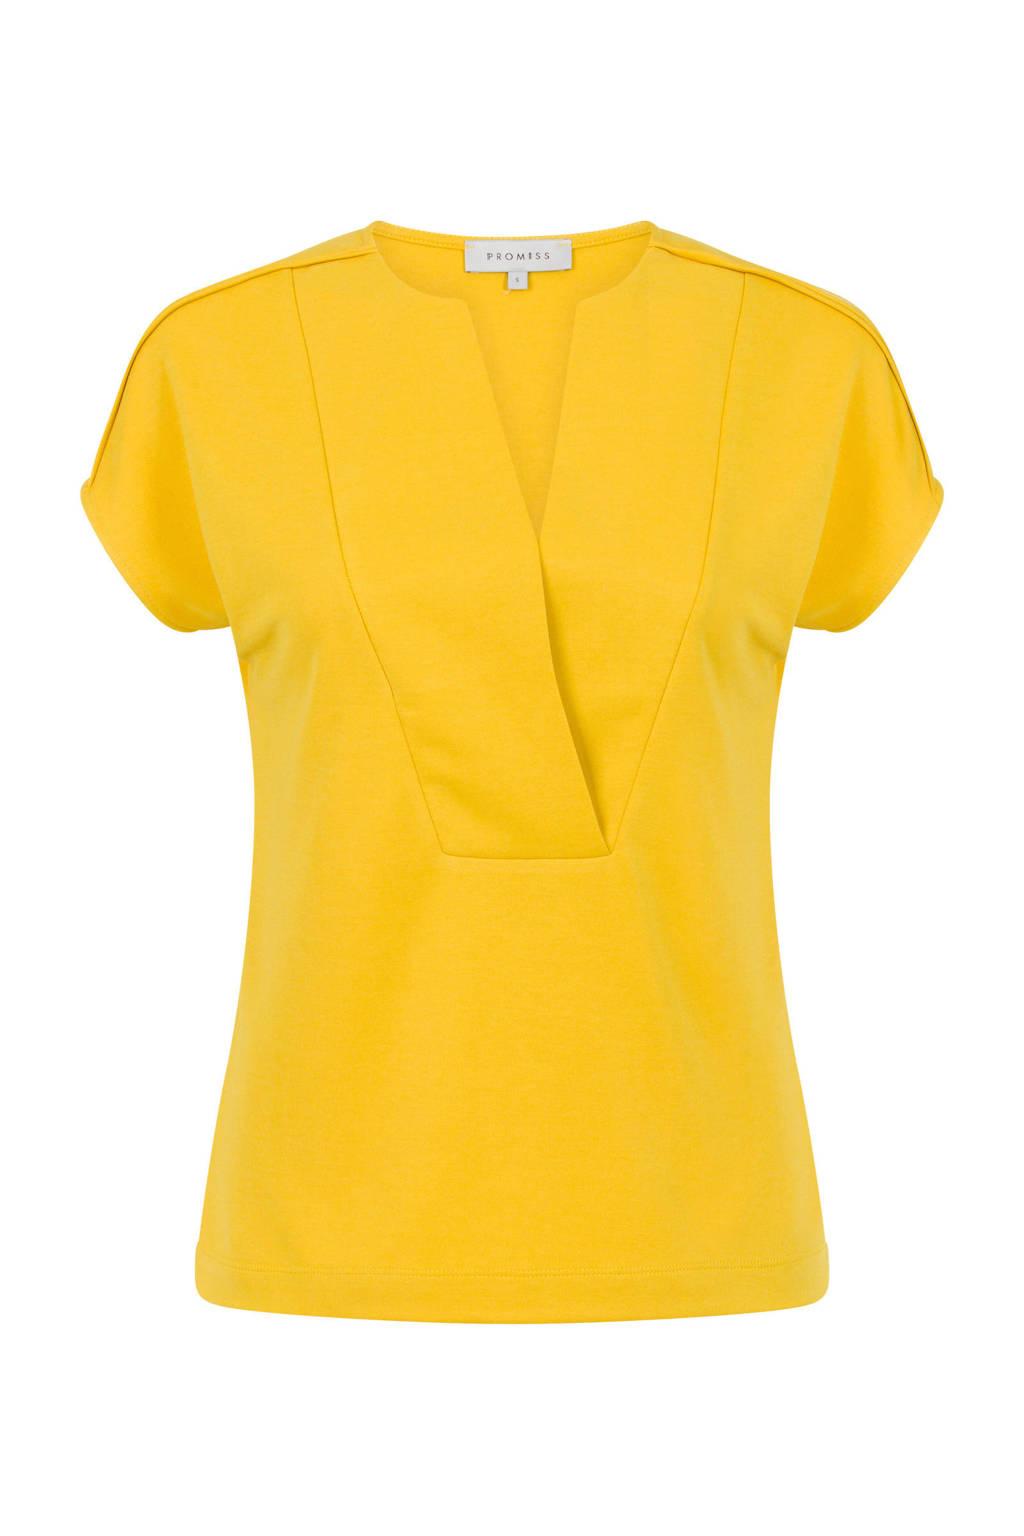 PROMISS T-shirt geel, Geel